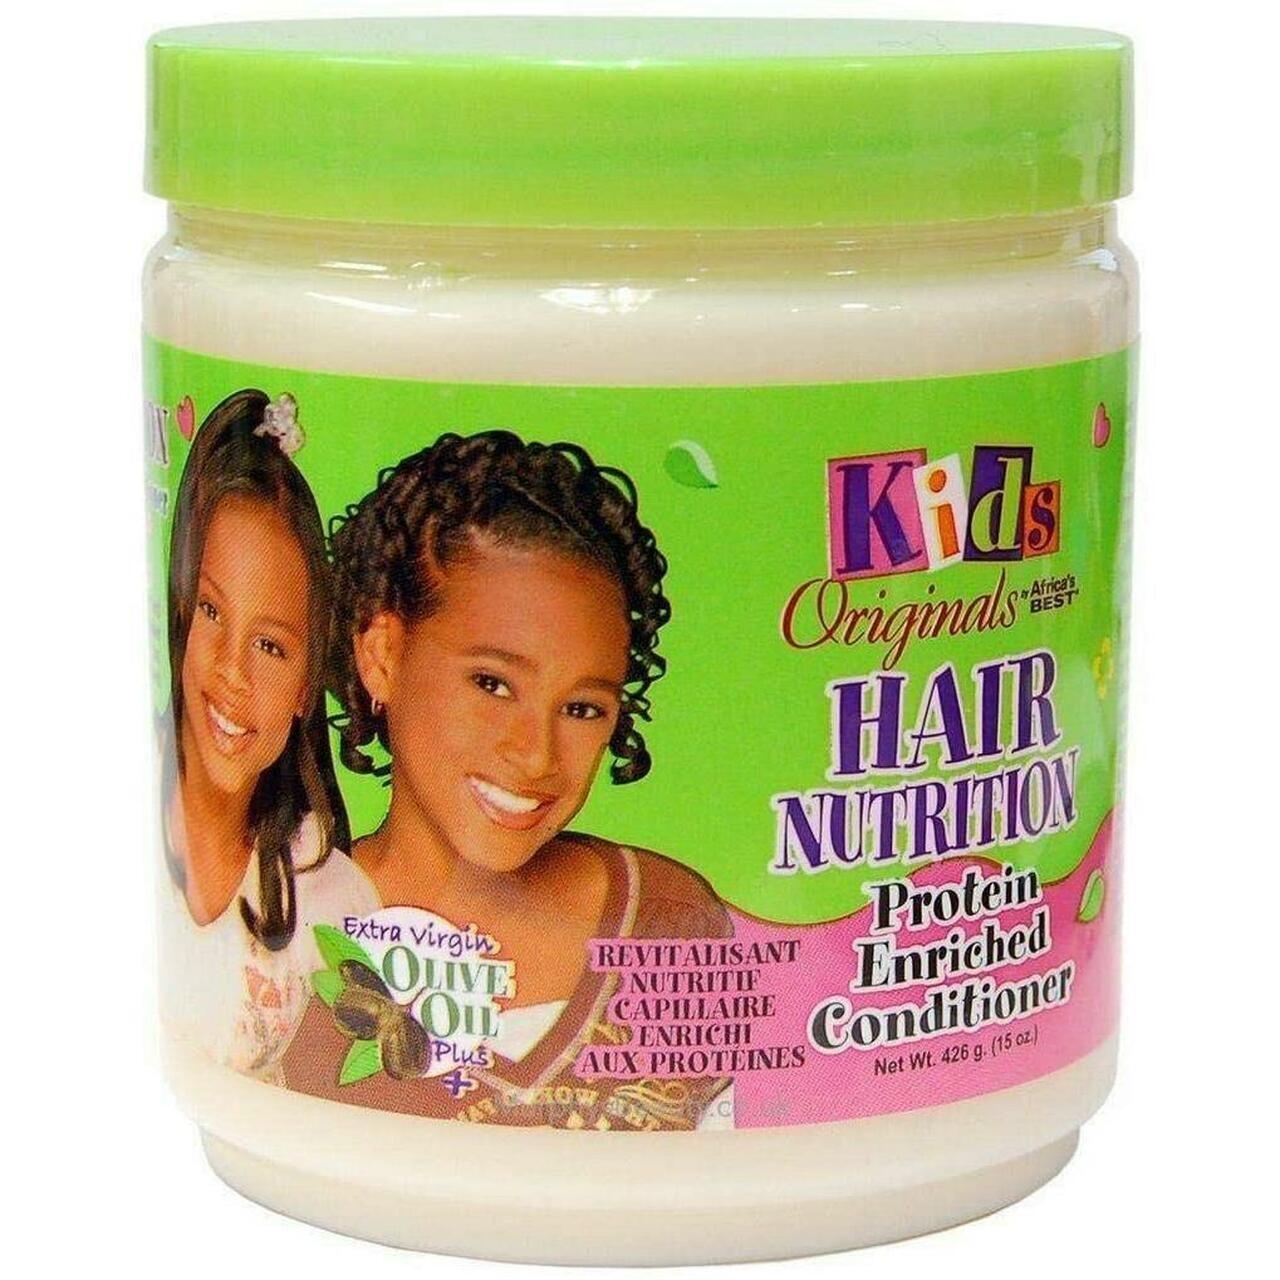 Organic Hair Nutrition for Kids